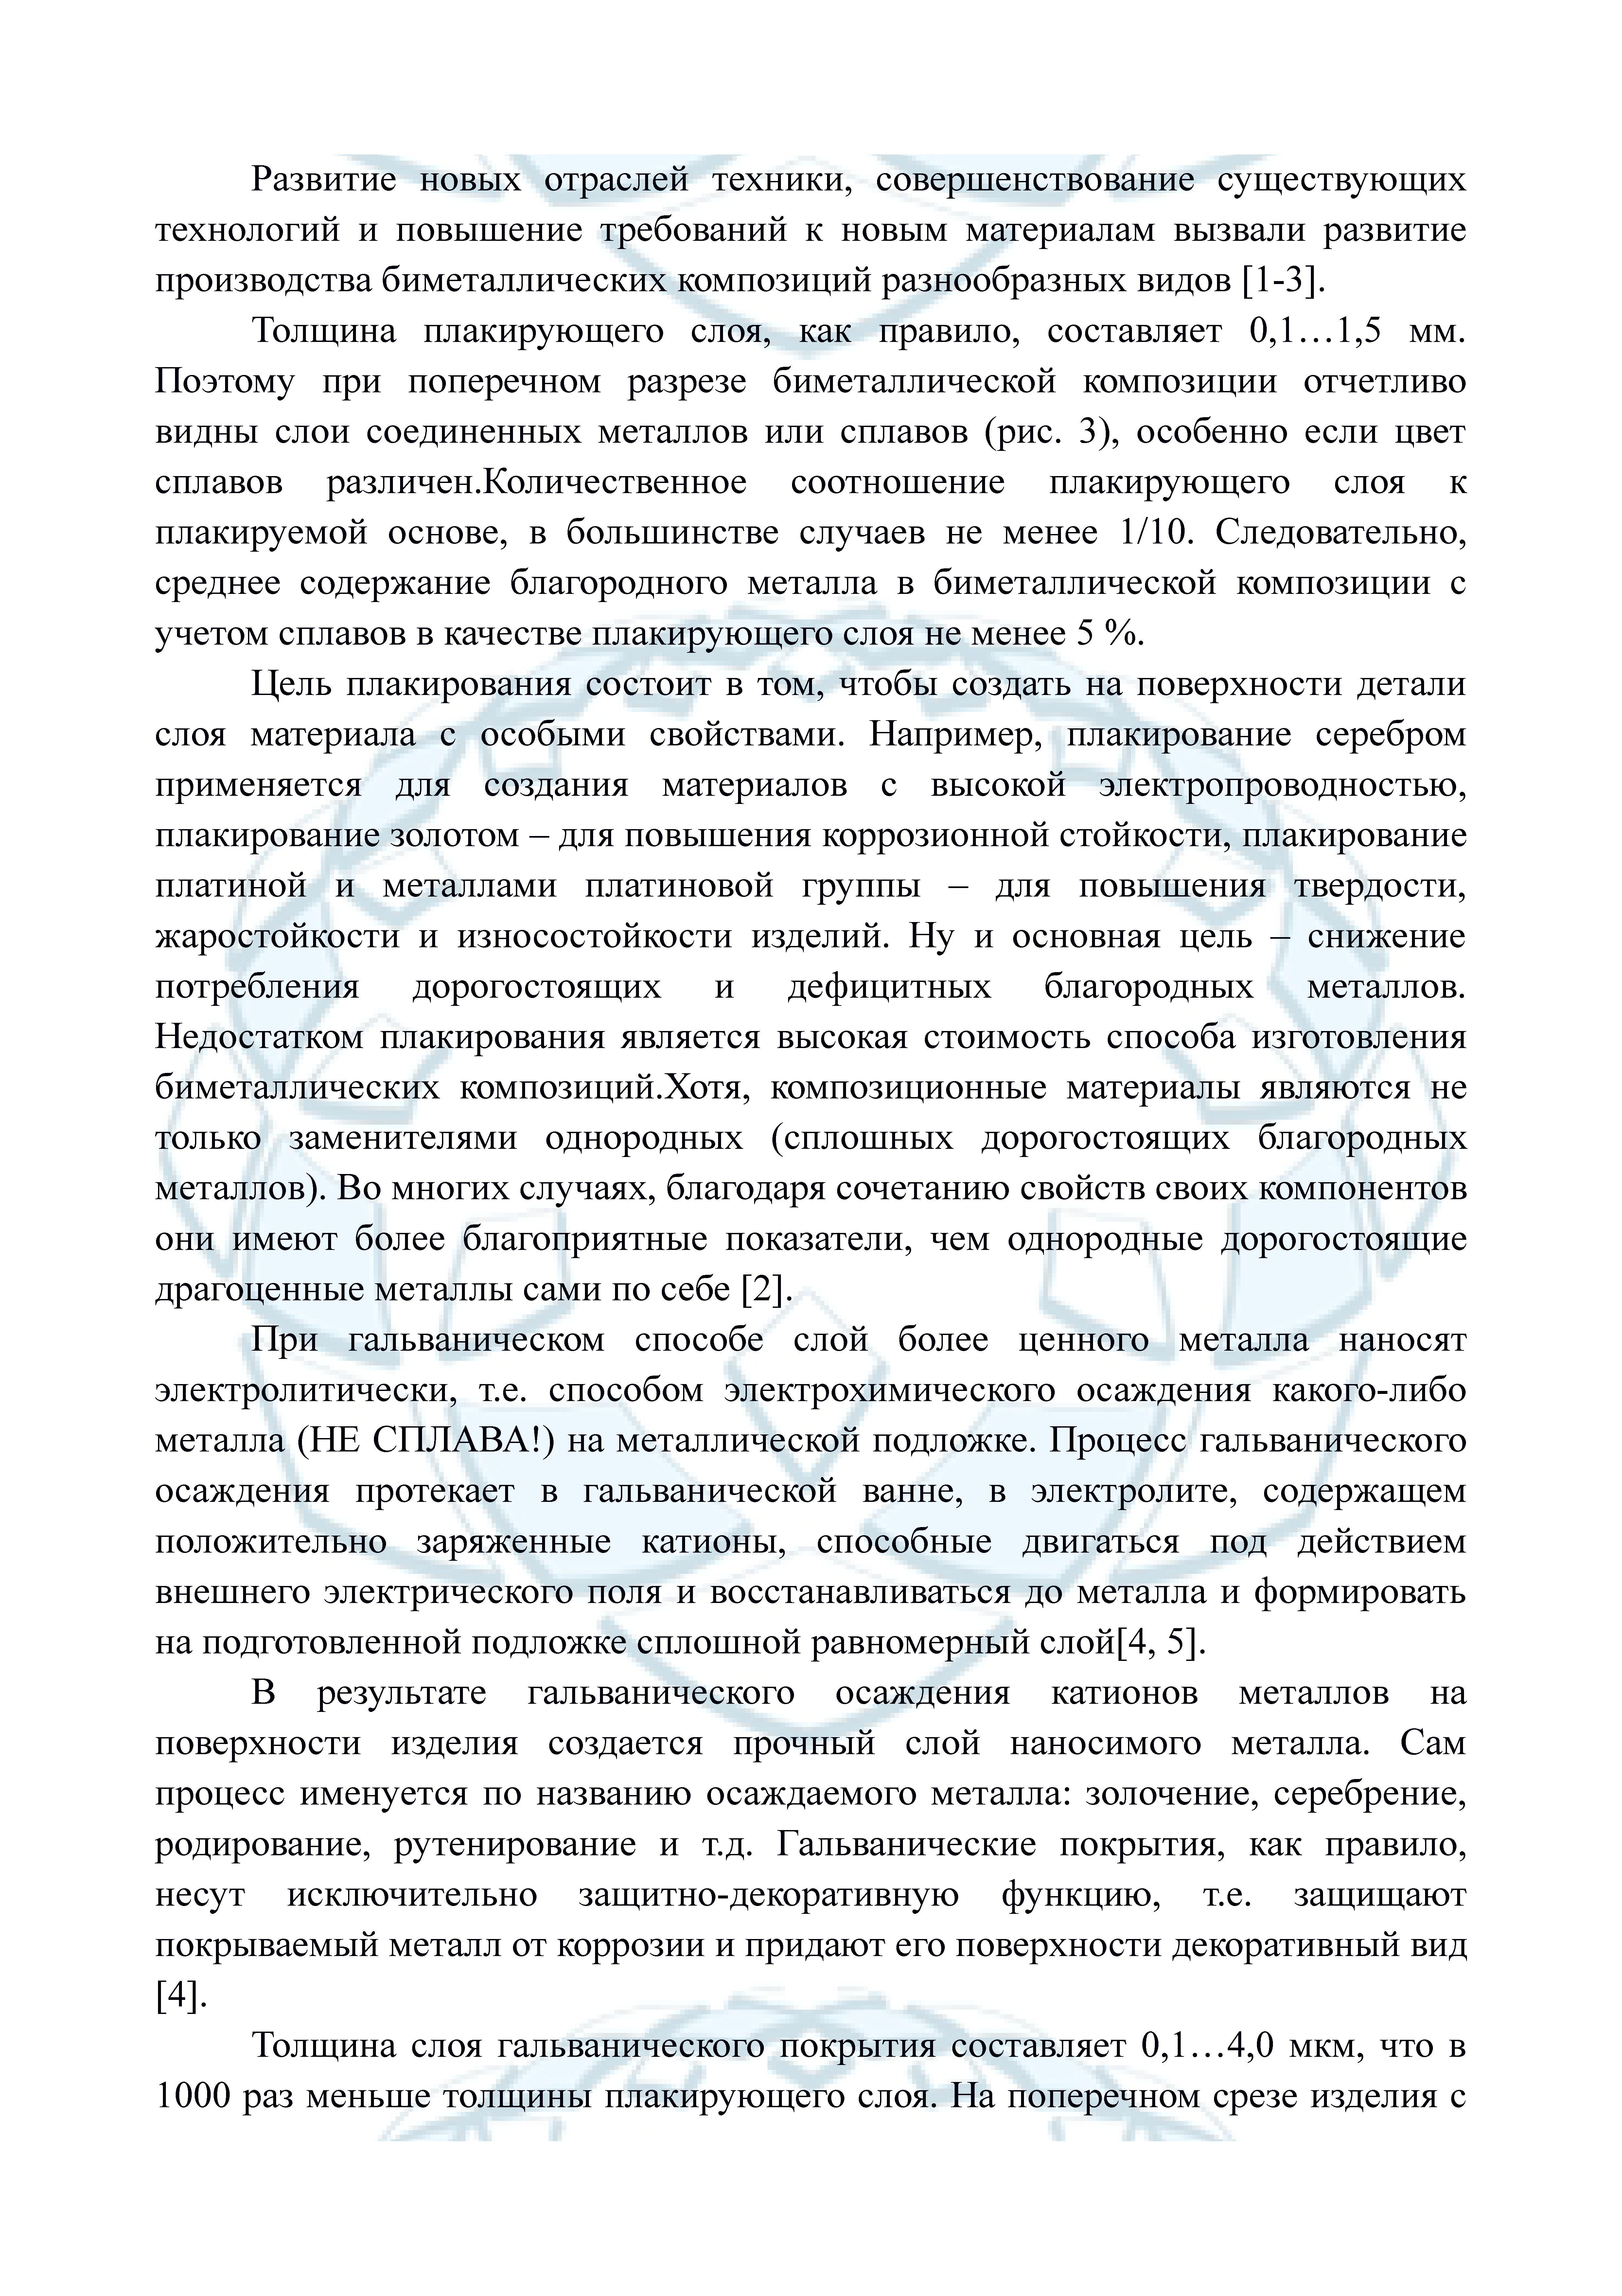 Кредит в миб банке срочно - mjzkru